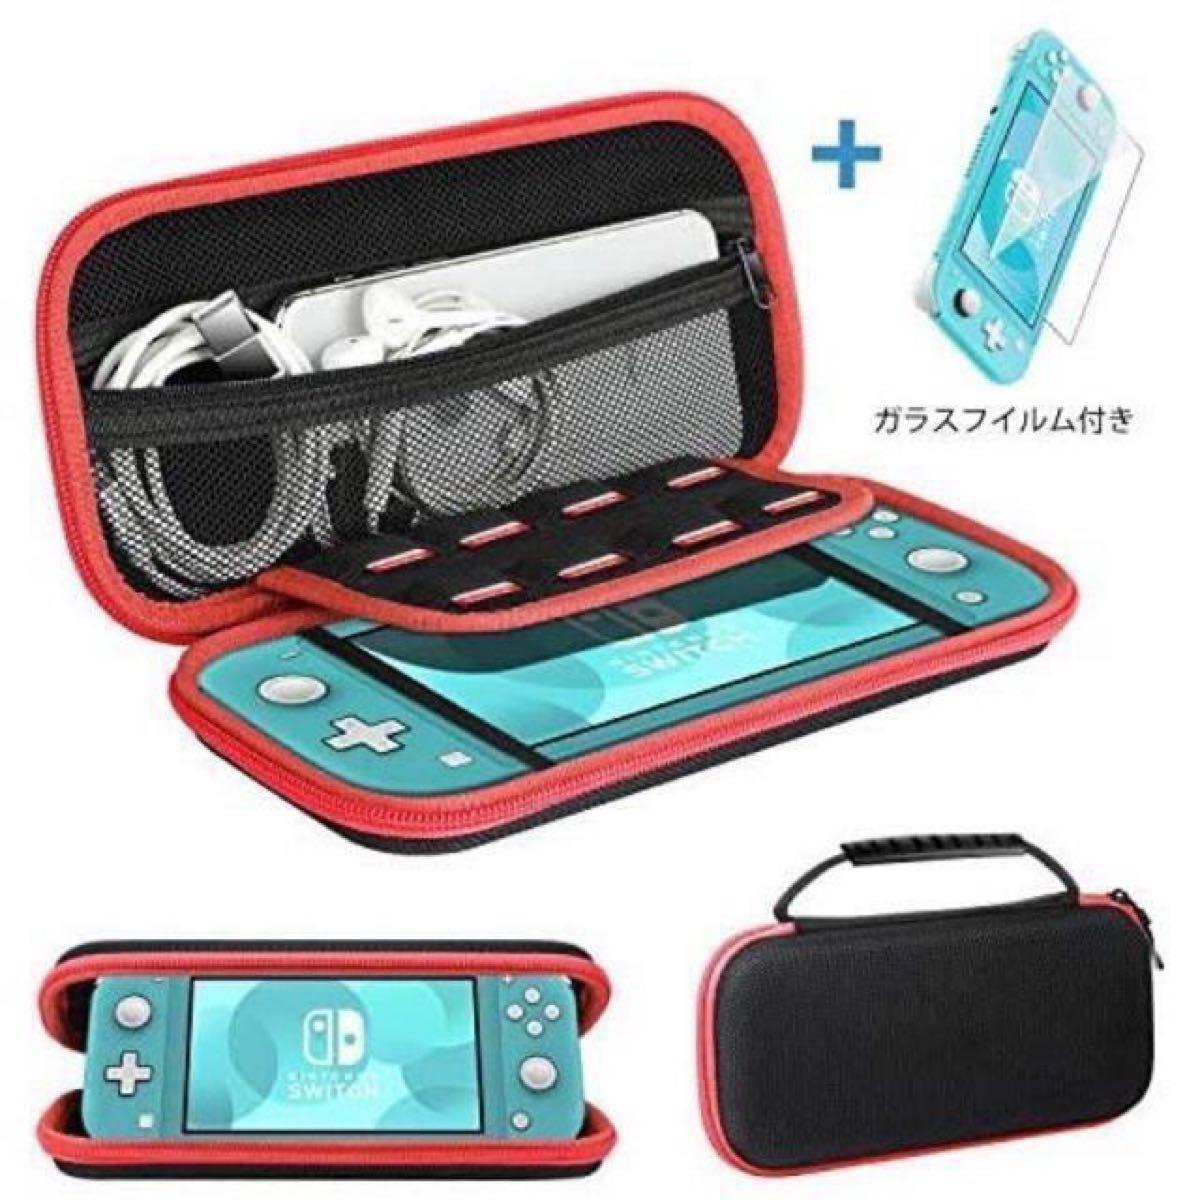 Nintendo Switch 収納バッグ 任天堂スイッチケース 任天堂スイッチ